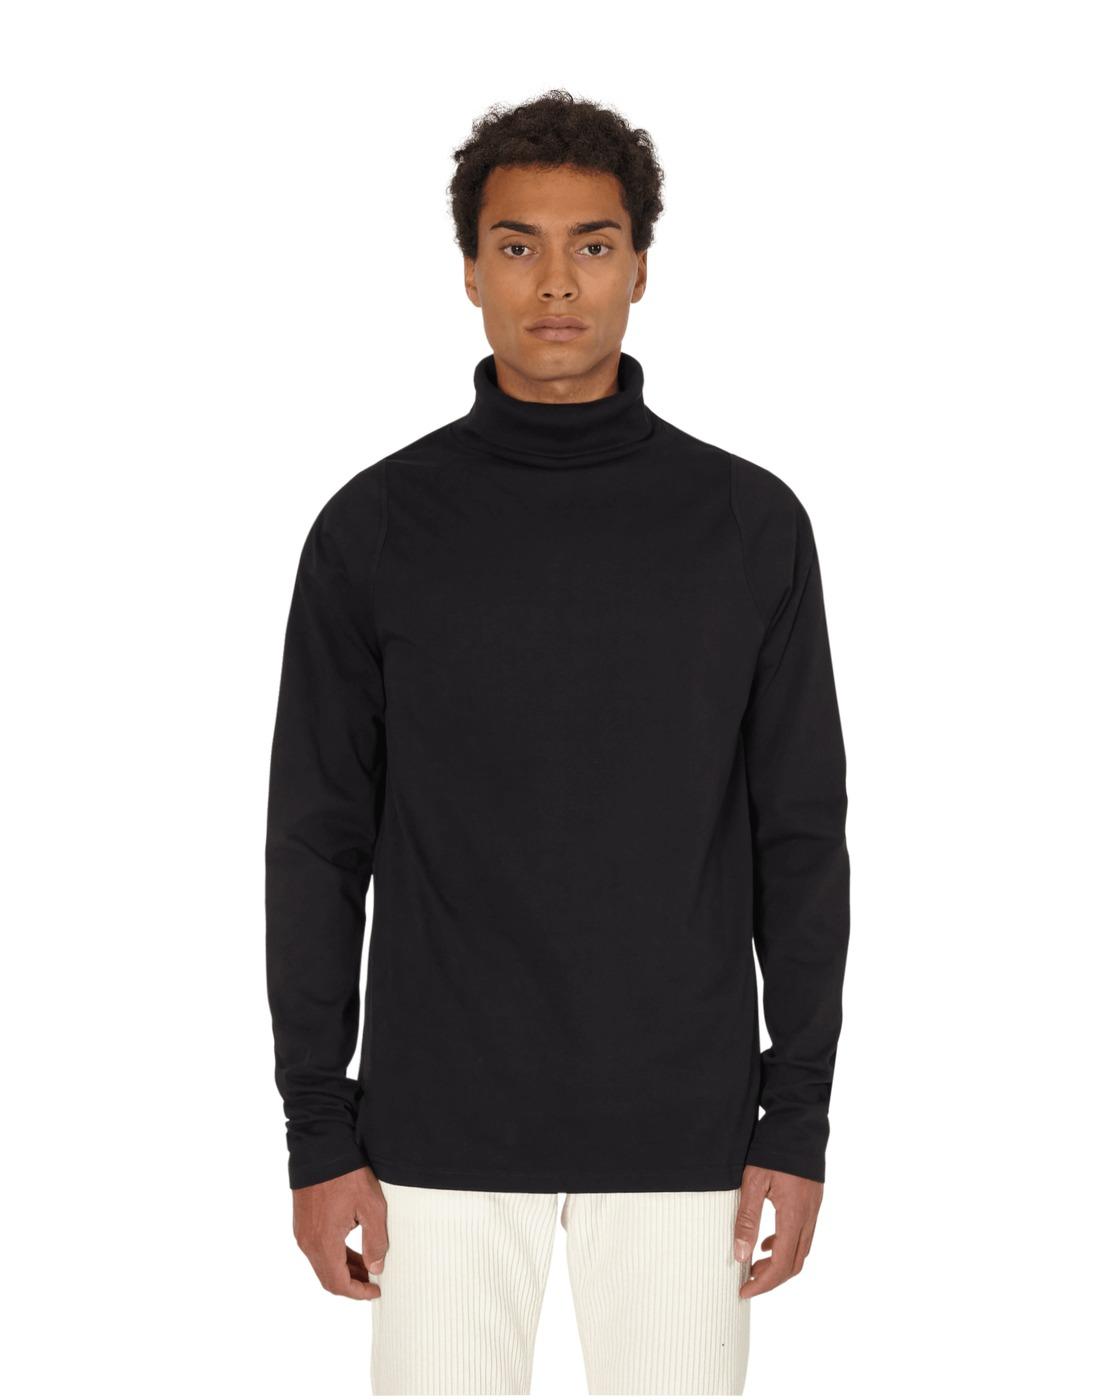 Martine Rose Perfection Turtle Neck Longsleeve T Shirt Black